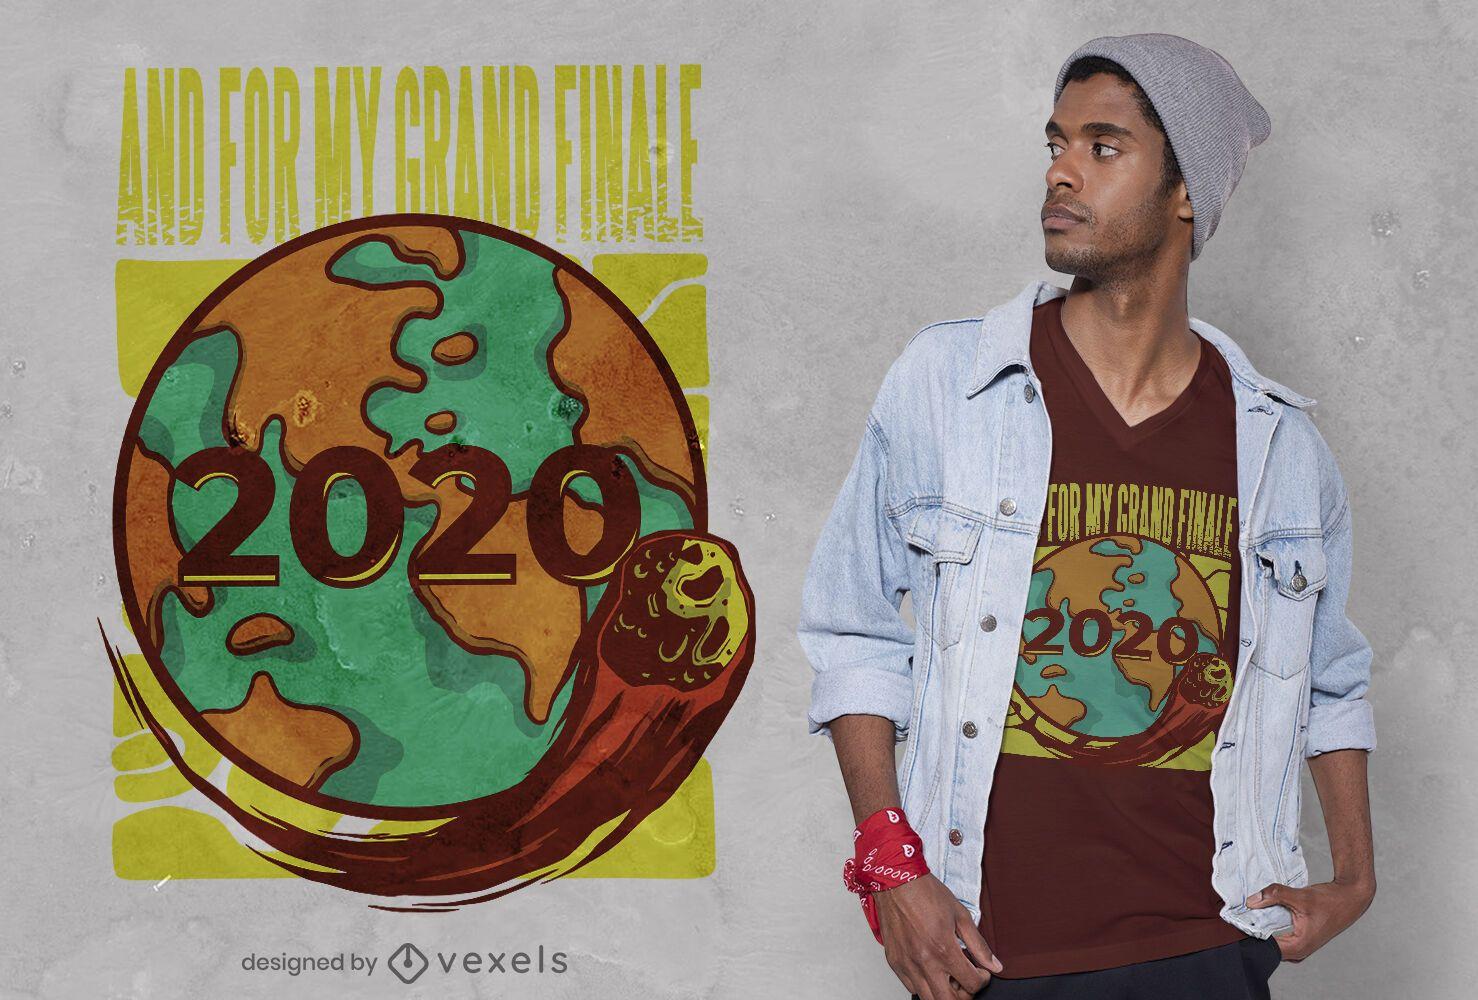 2020 grand finale t-shirt design